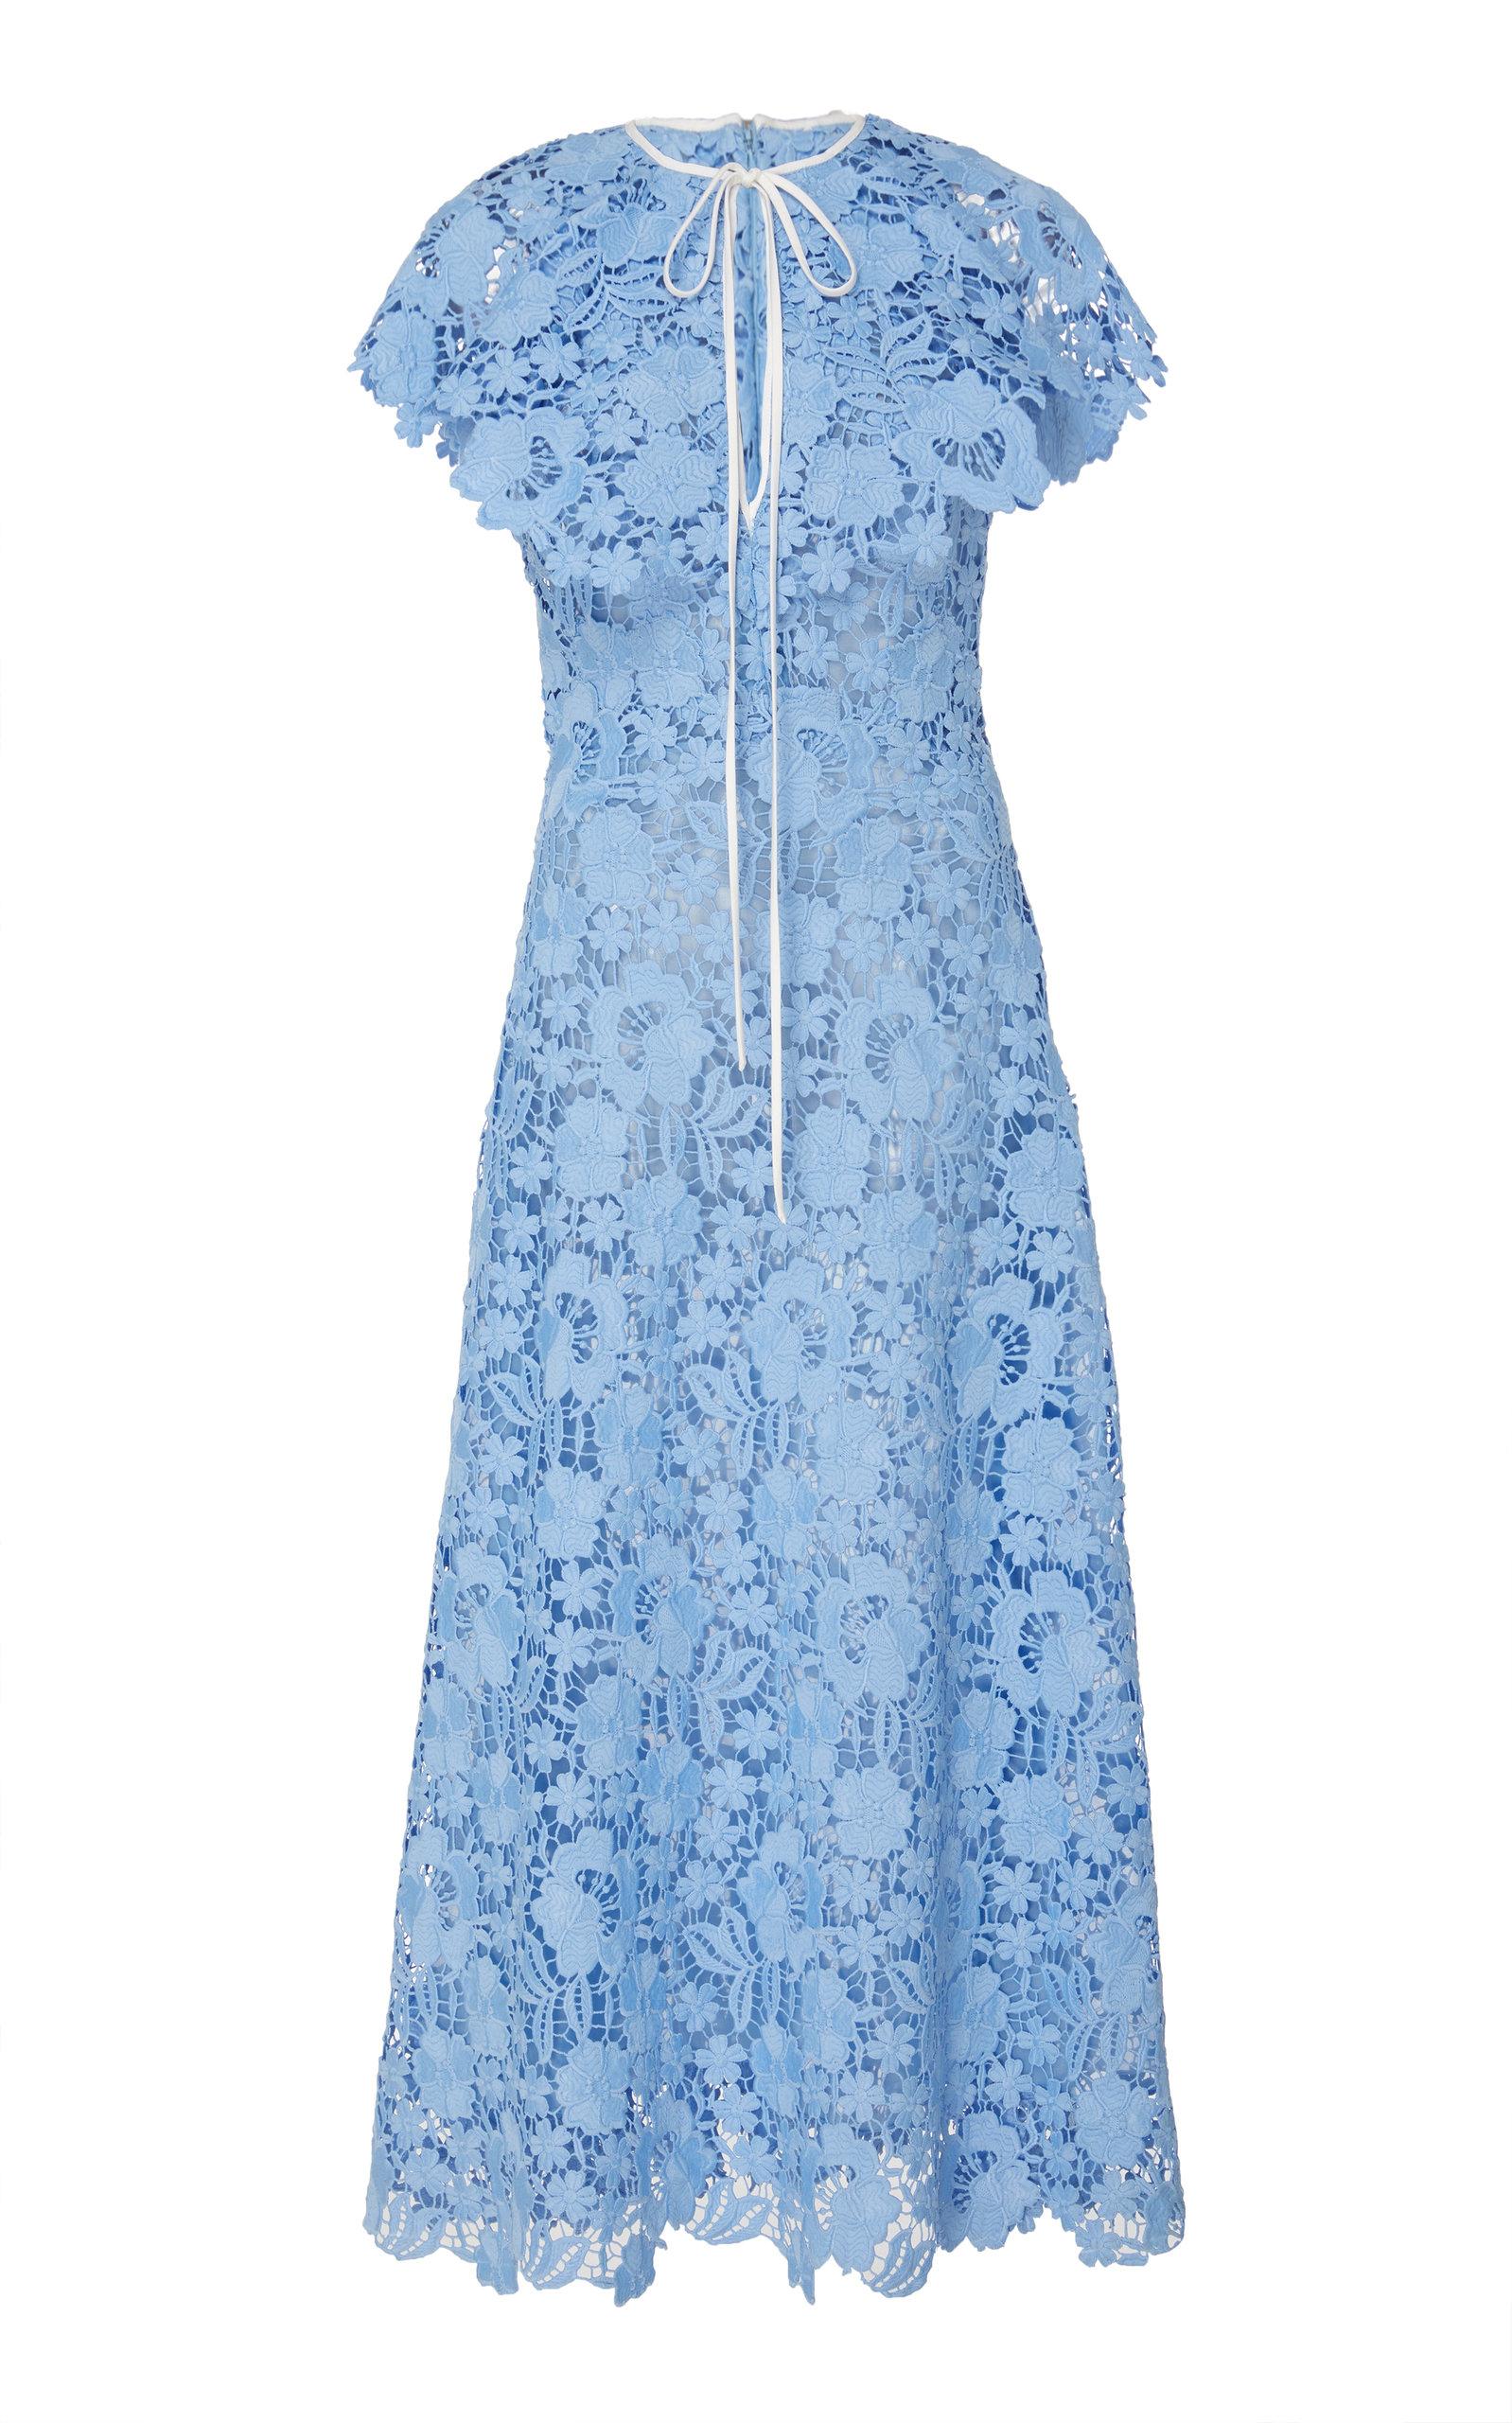 e0b49d66ccd7 Lela Rose Cap-Sleeve Guipure Lace Dress In Blue